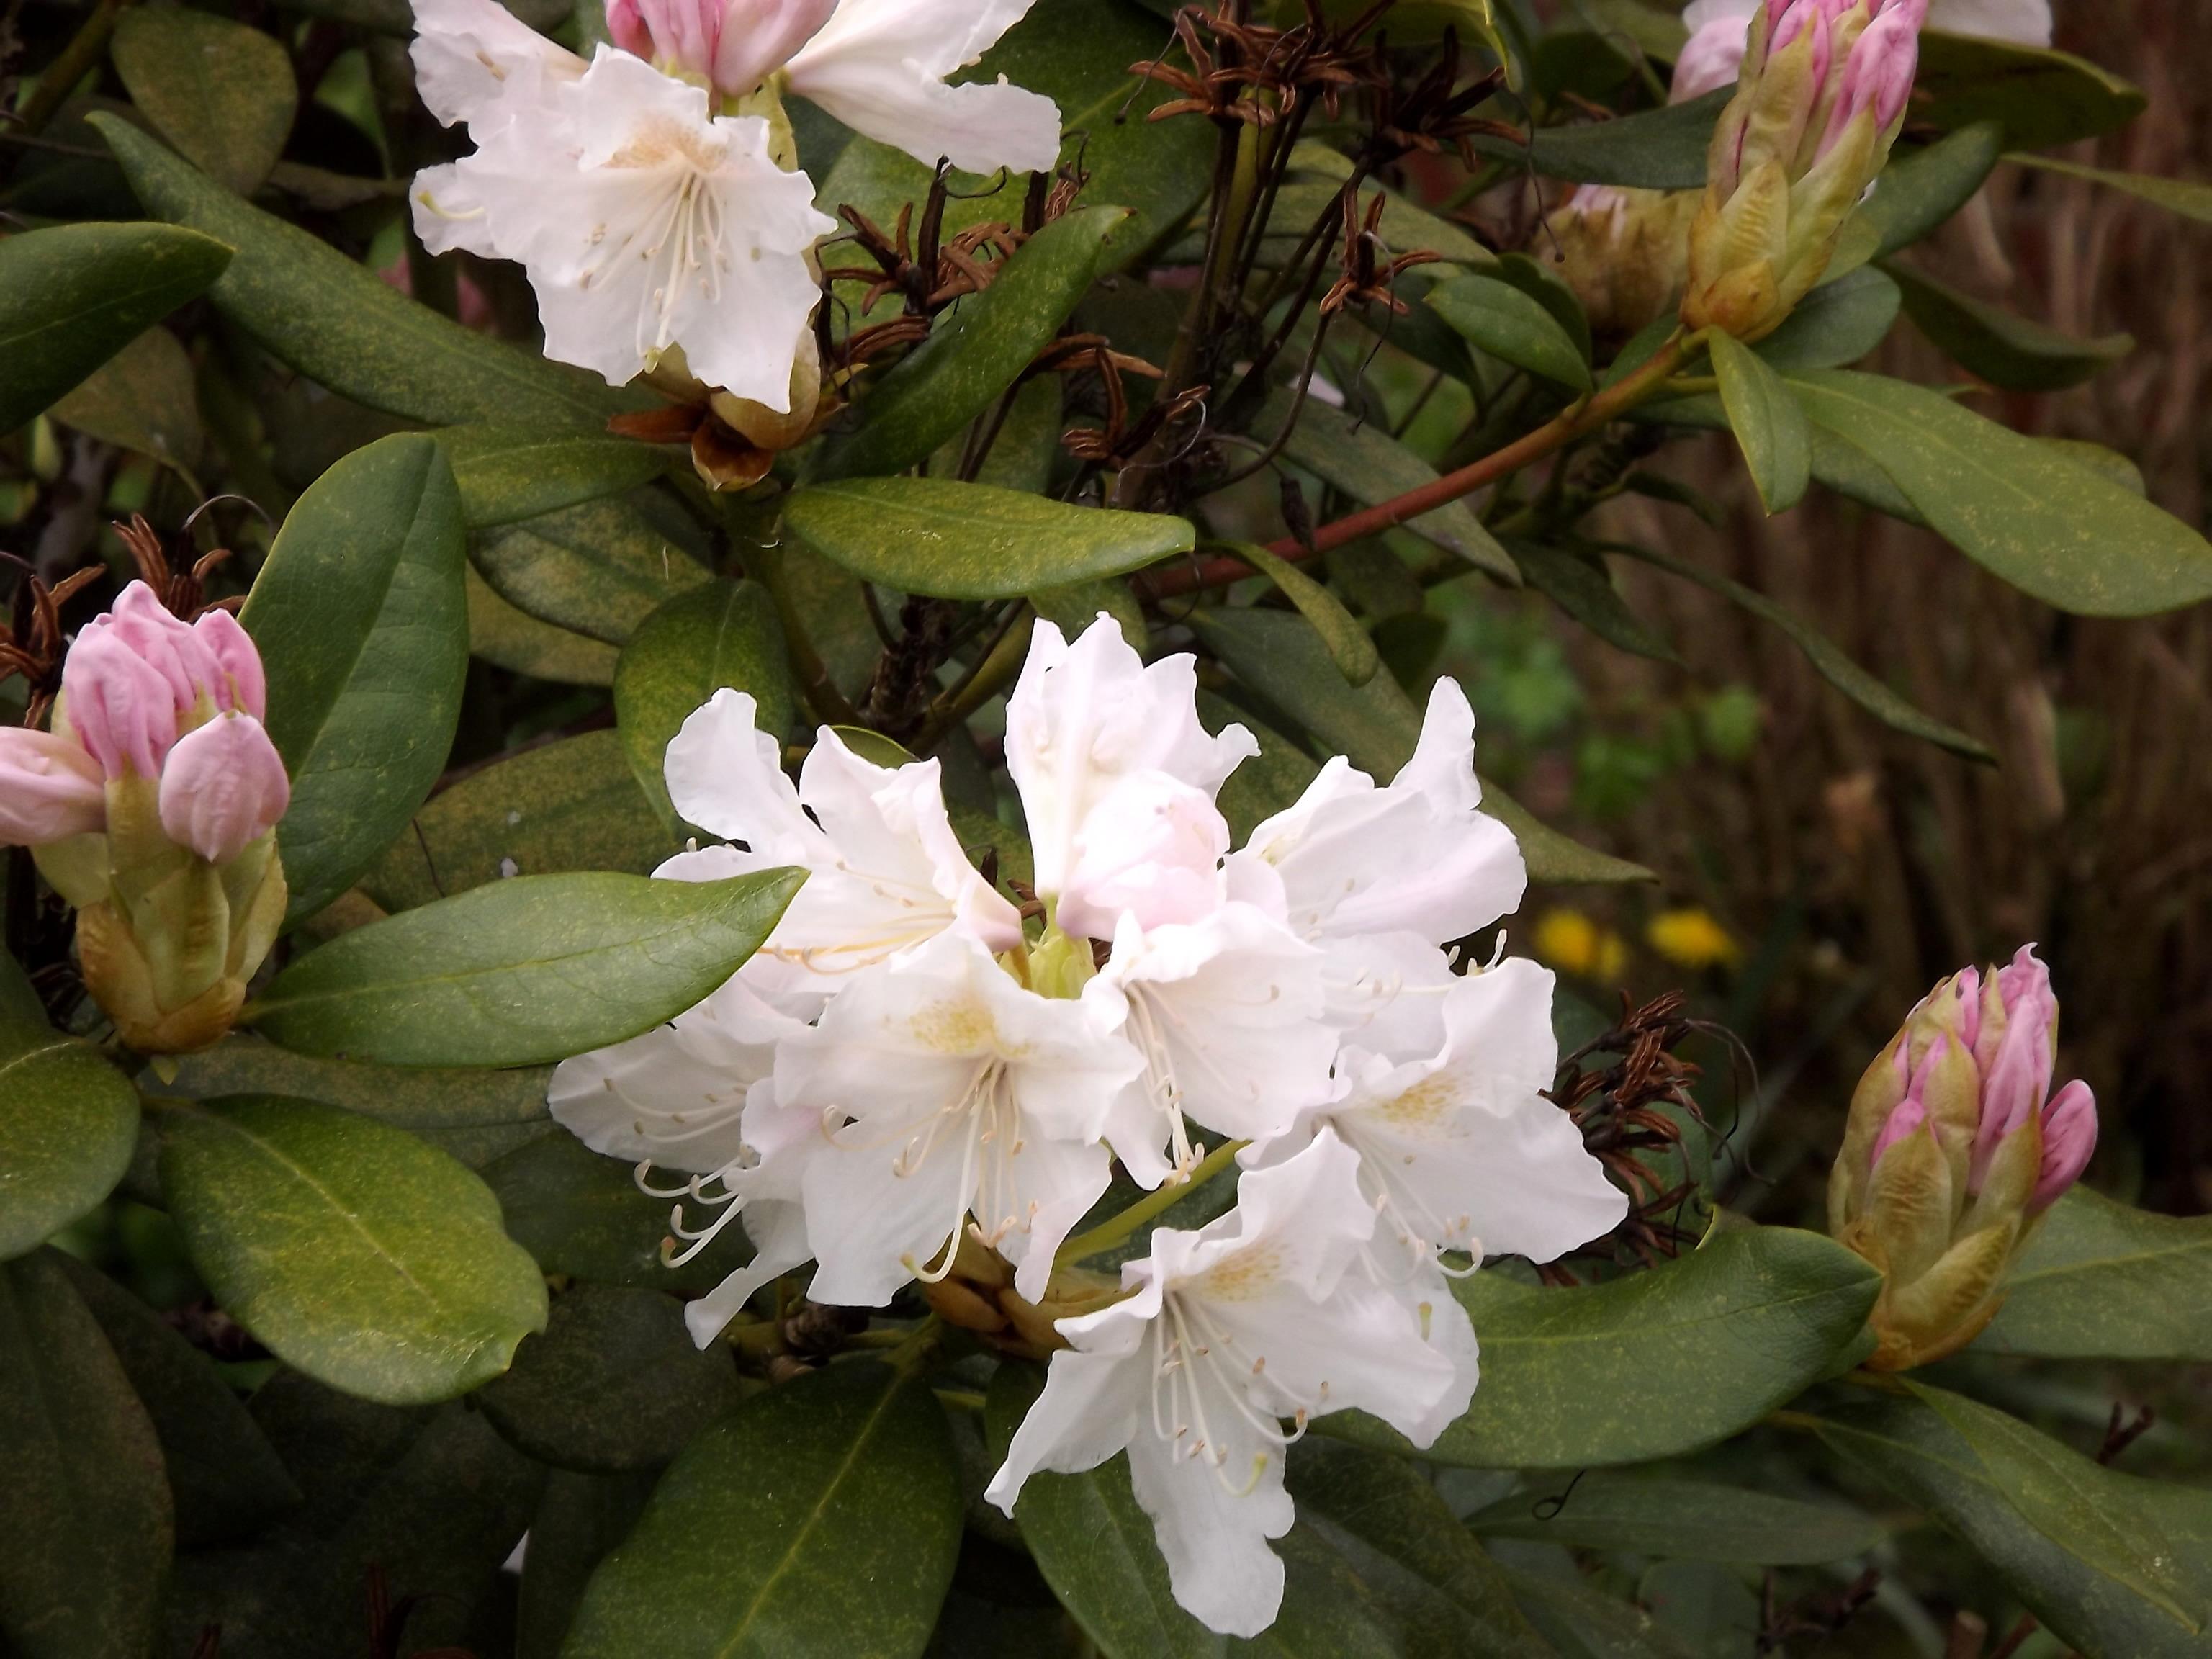 5991-rhododendron-weiss-rosa-blueten